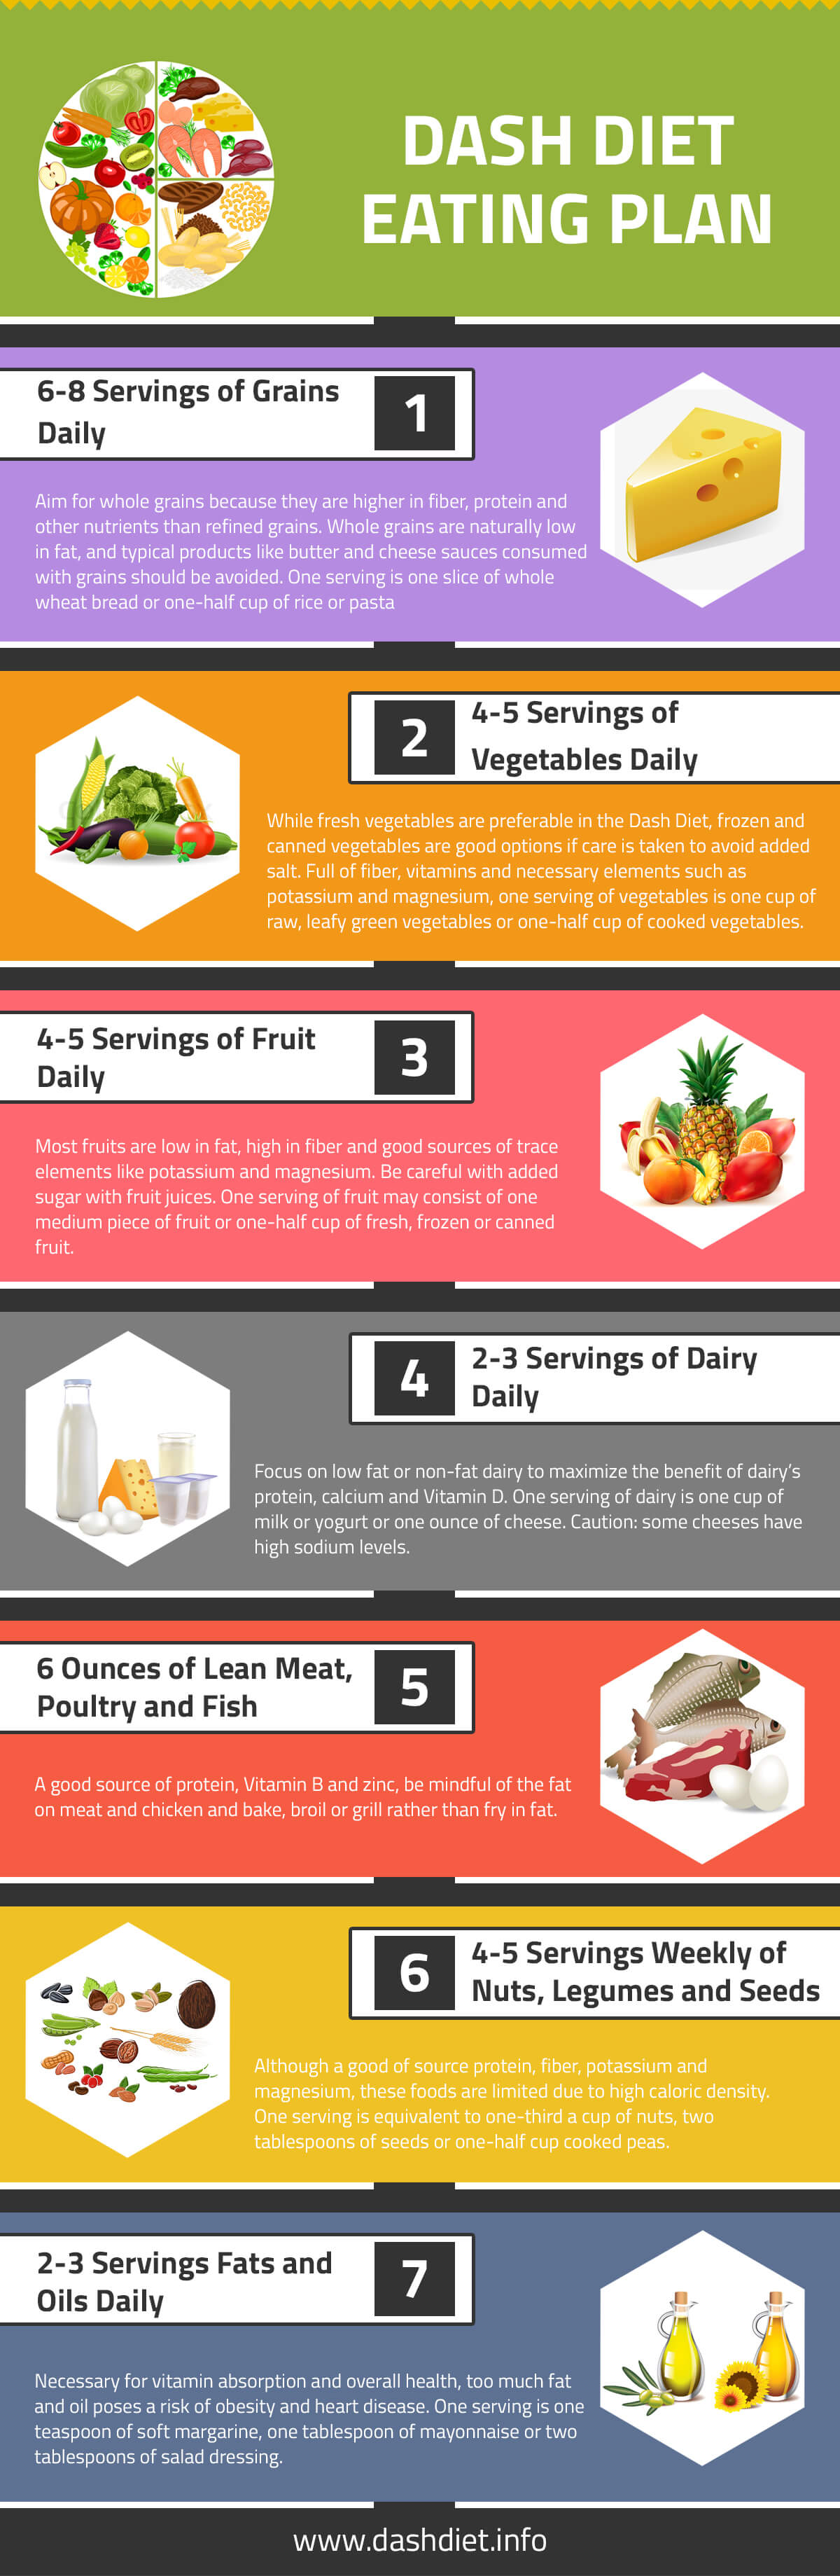 daily serving dash diet